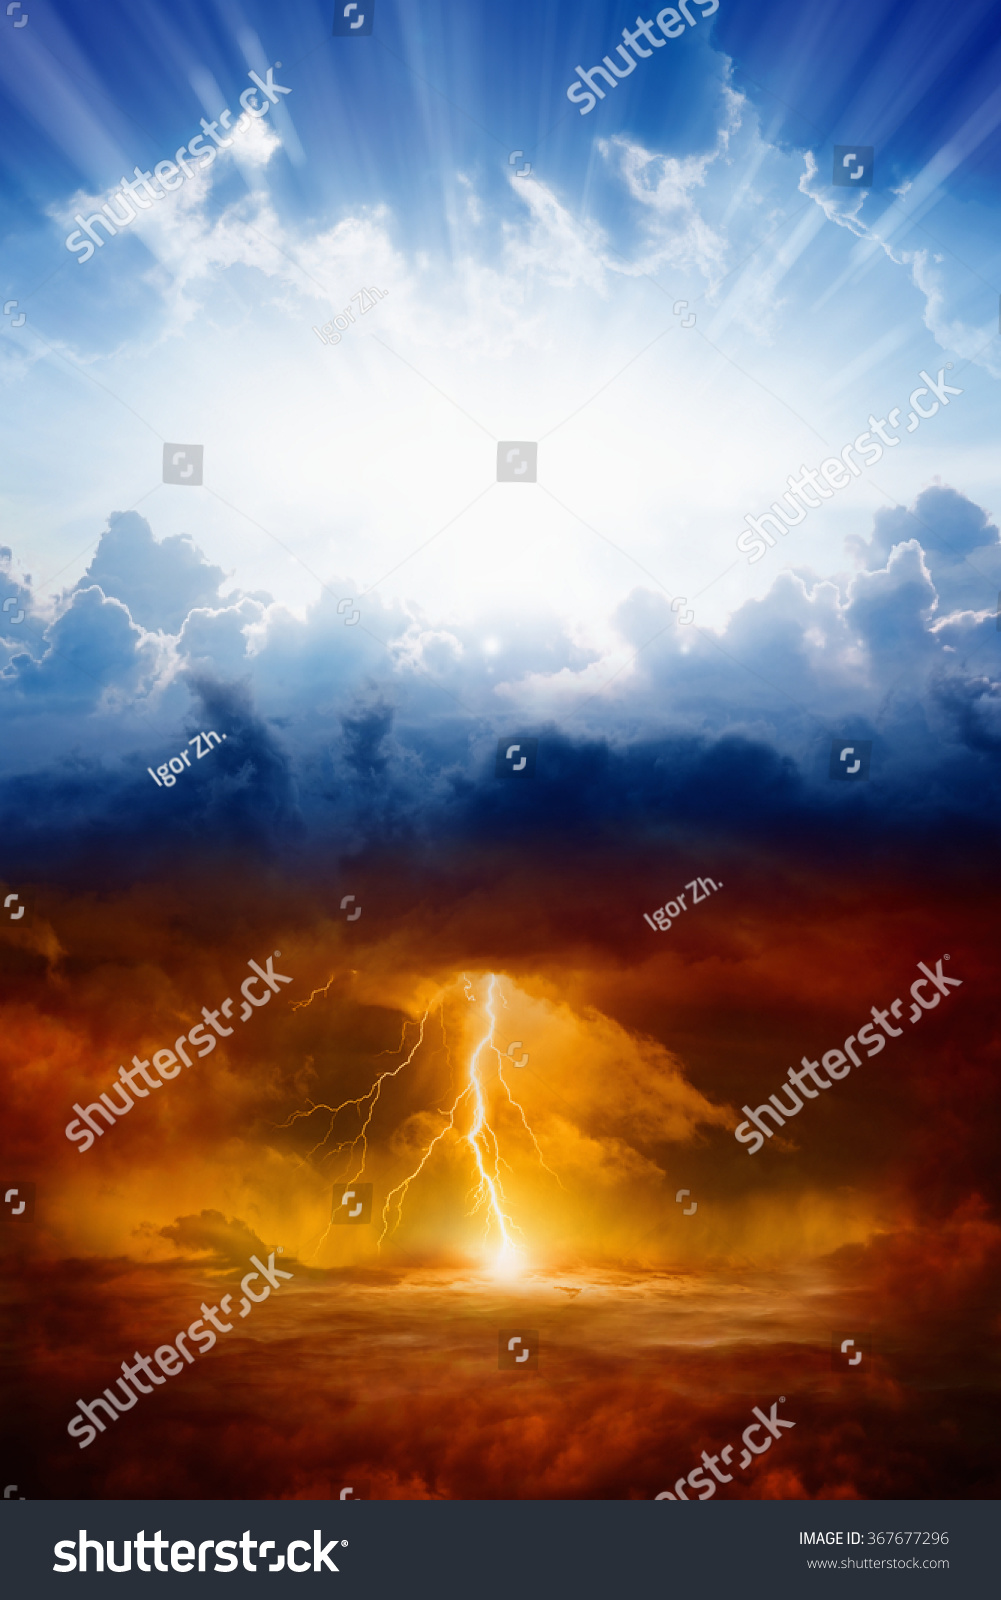 Religious Background Heaven Hell Good Evil Stock Photo